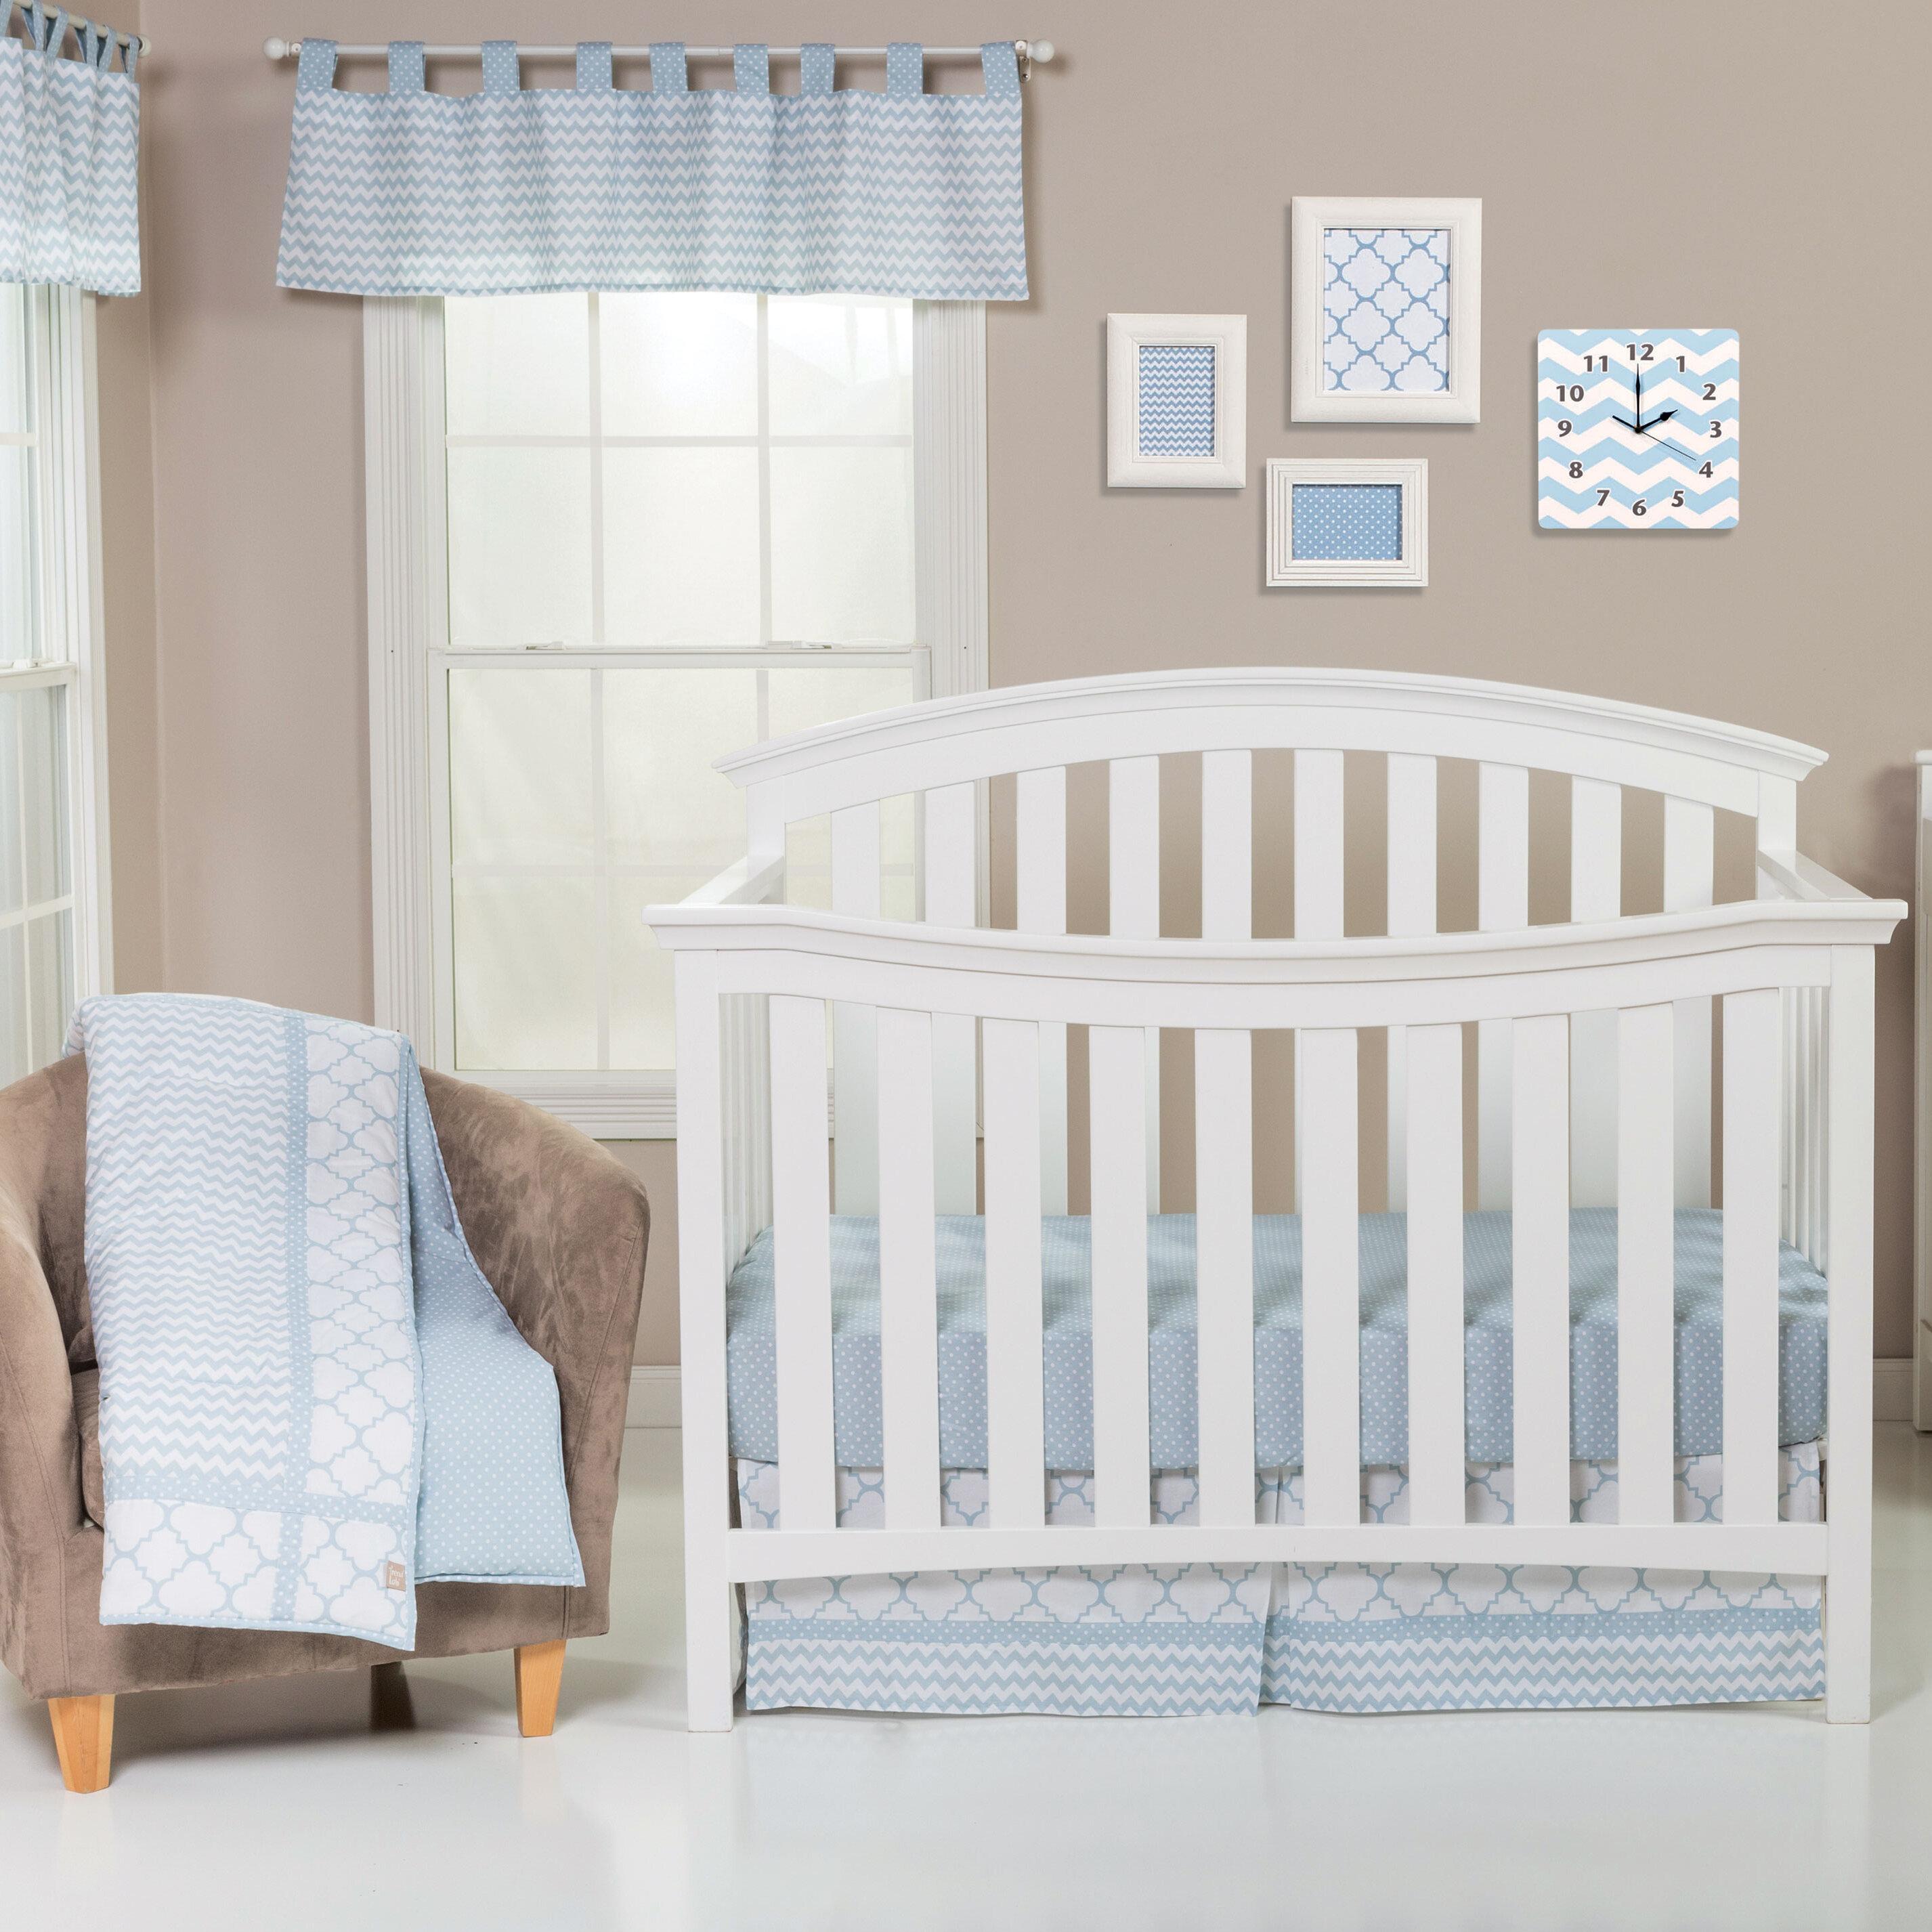 c05087c52a89 Harriet Bee Townsley 3 Piece Crib Bedding Set   Reviews